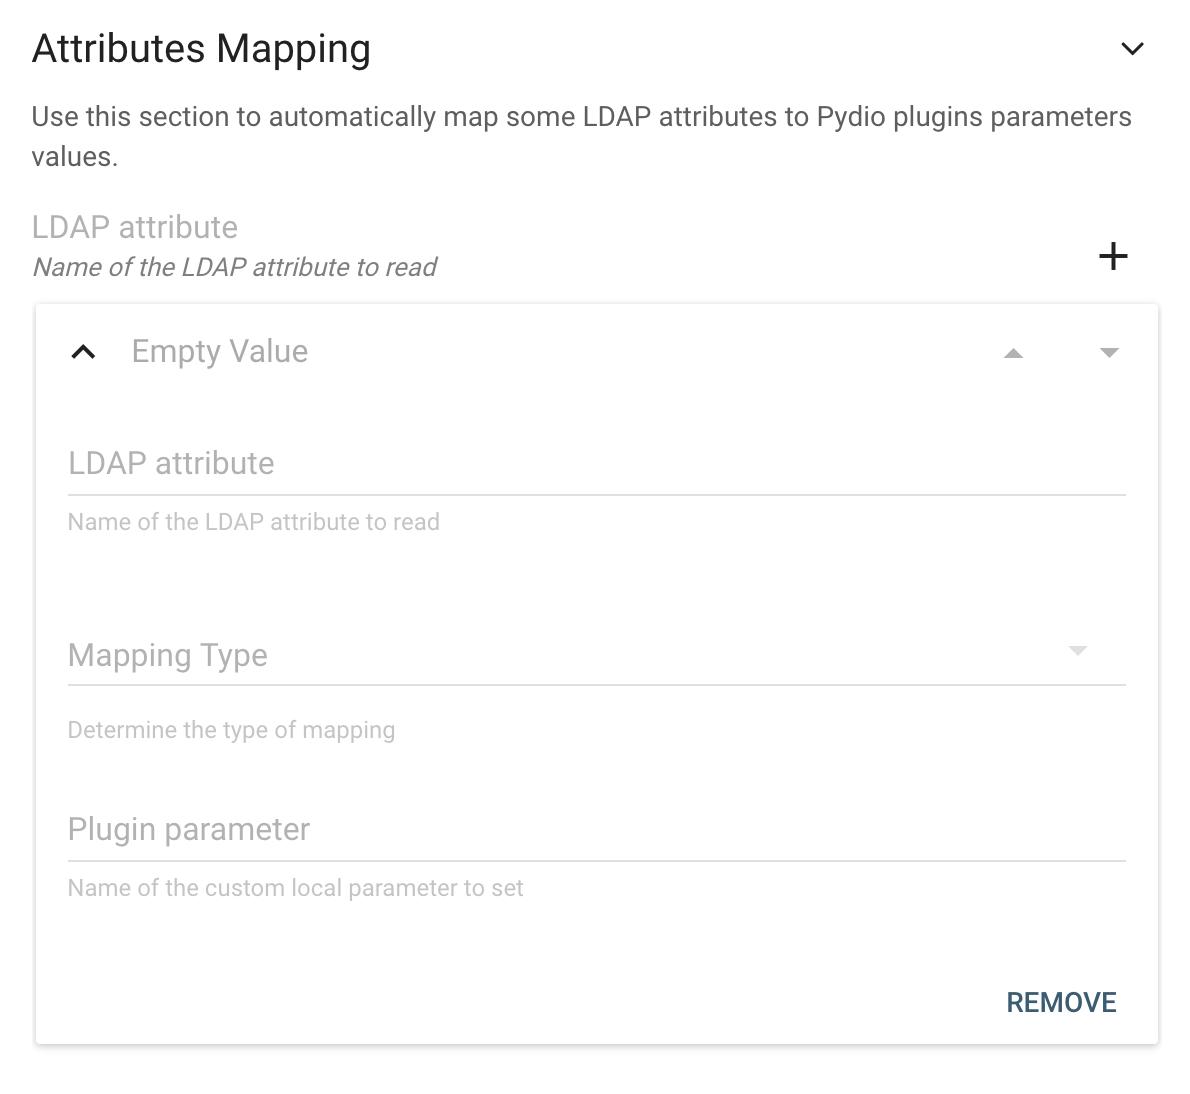 P8] Advanced Authentication with LDAP/AD | Pydio